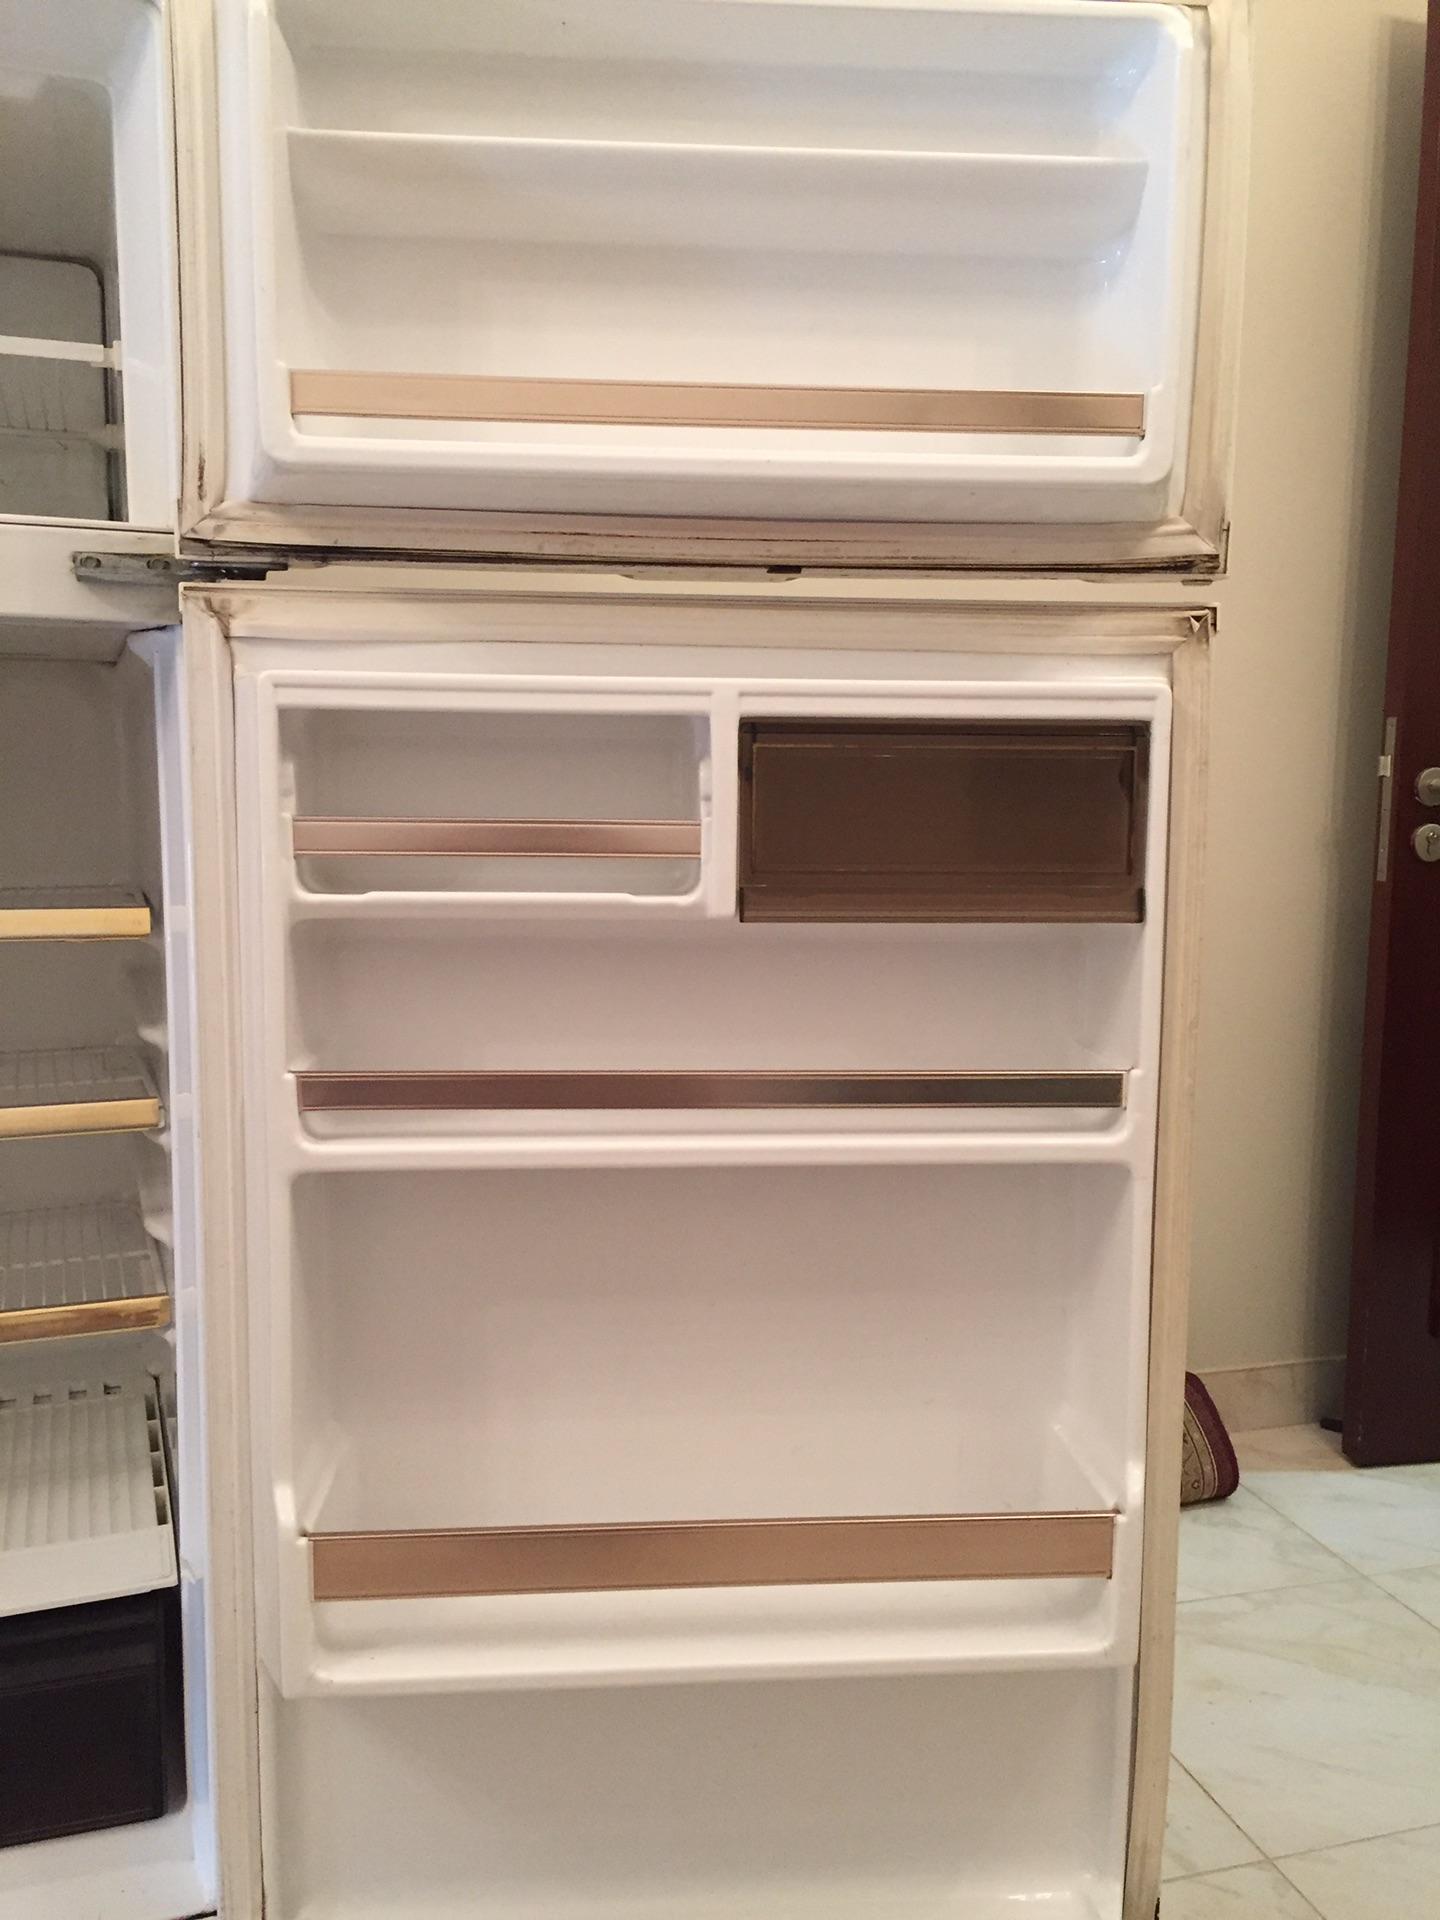 Hitachi latest model fridge with 2 doors up and down-  ثلاجة جيبسون للبيع الدمام...